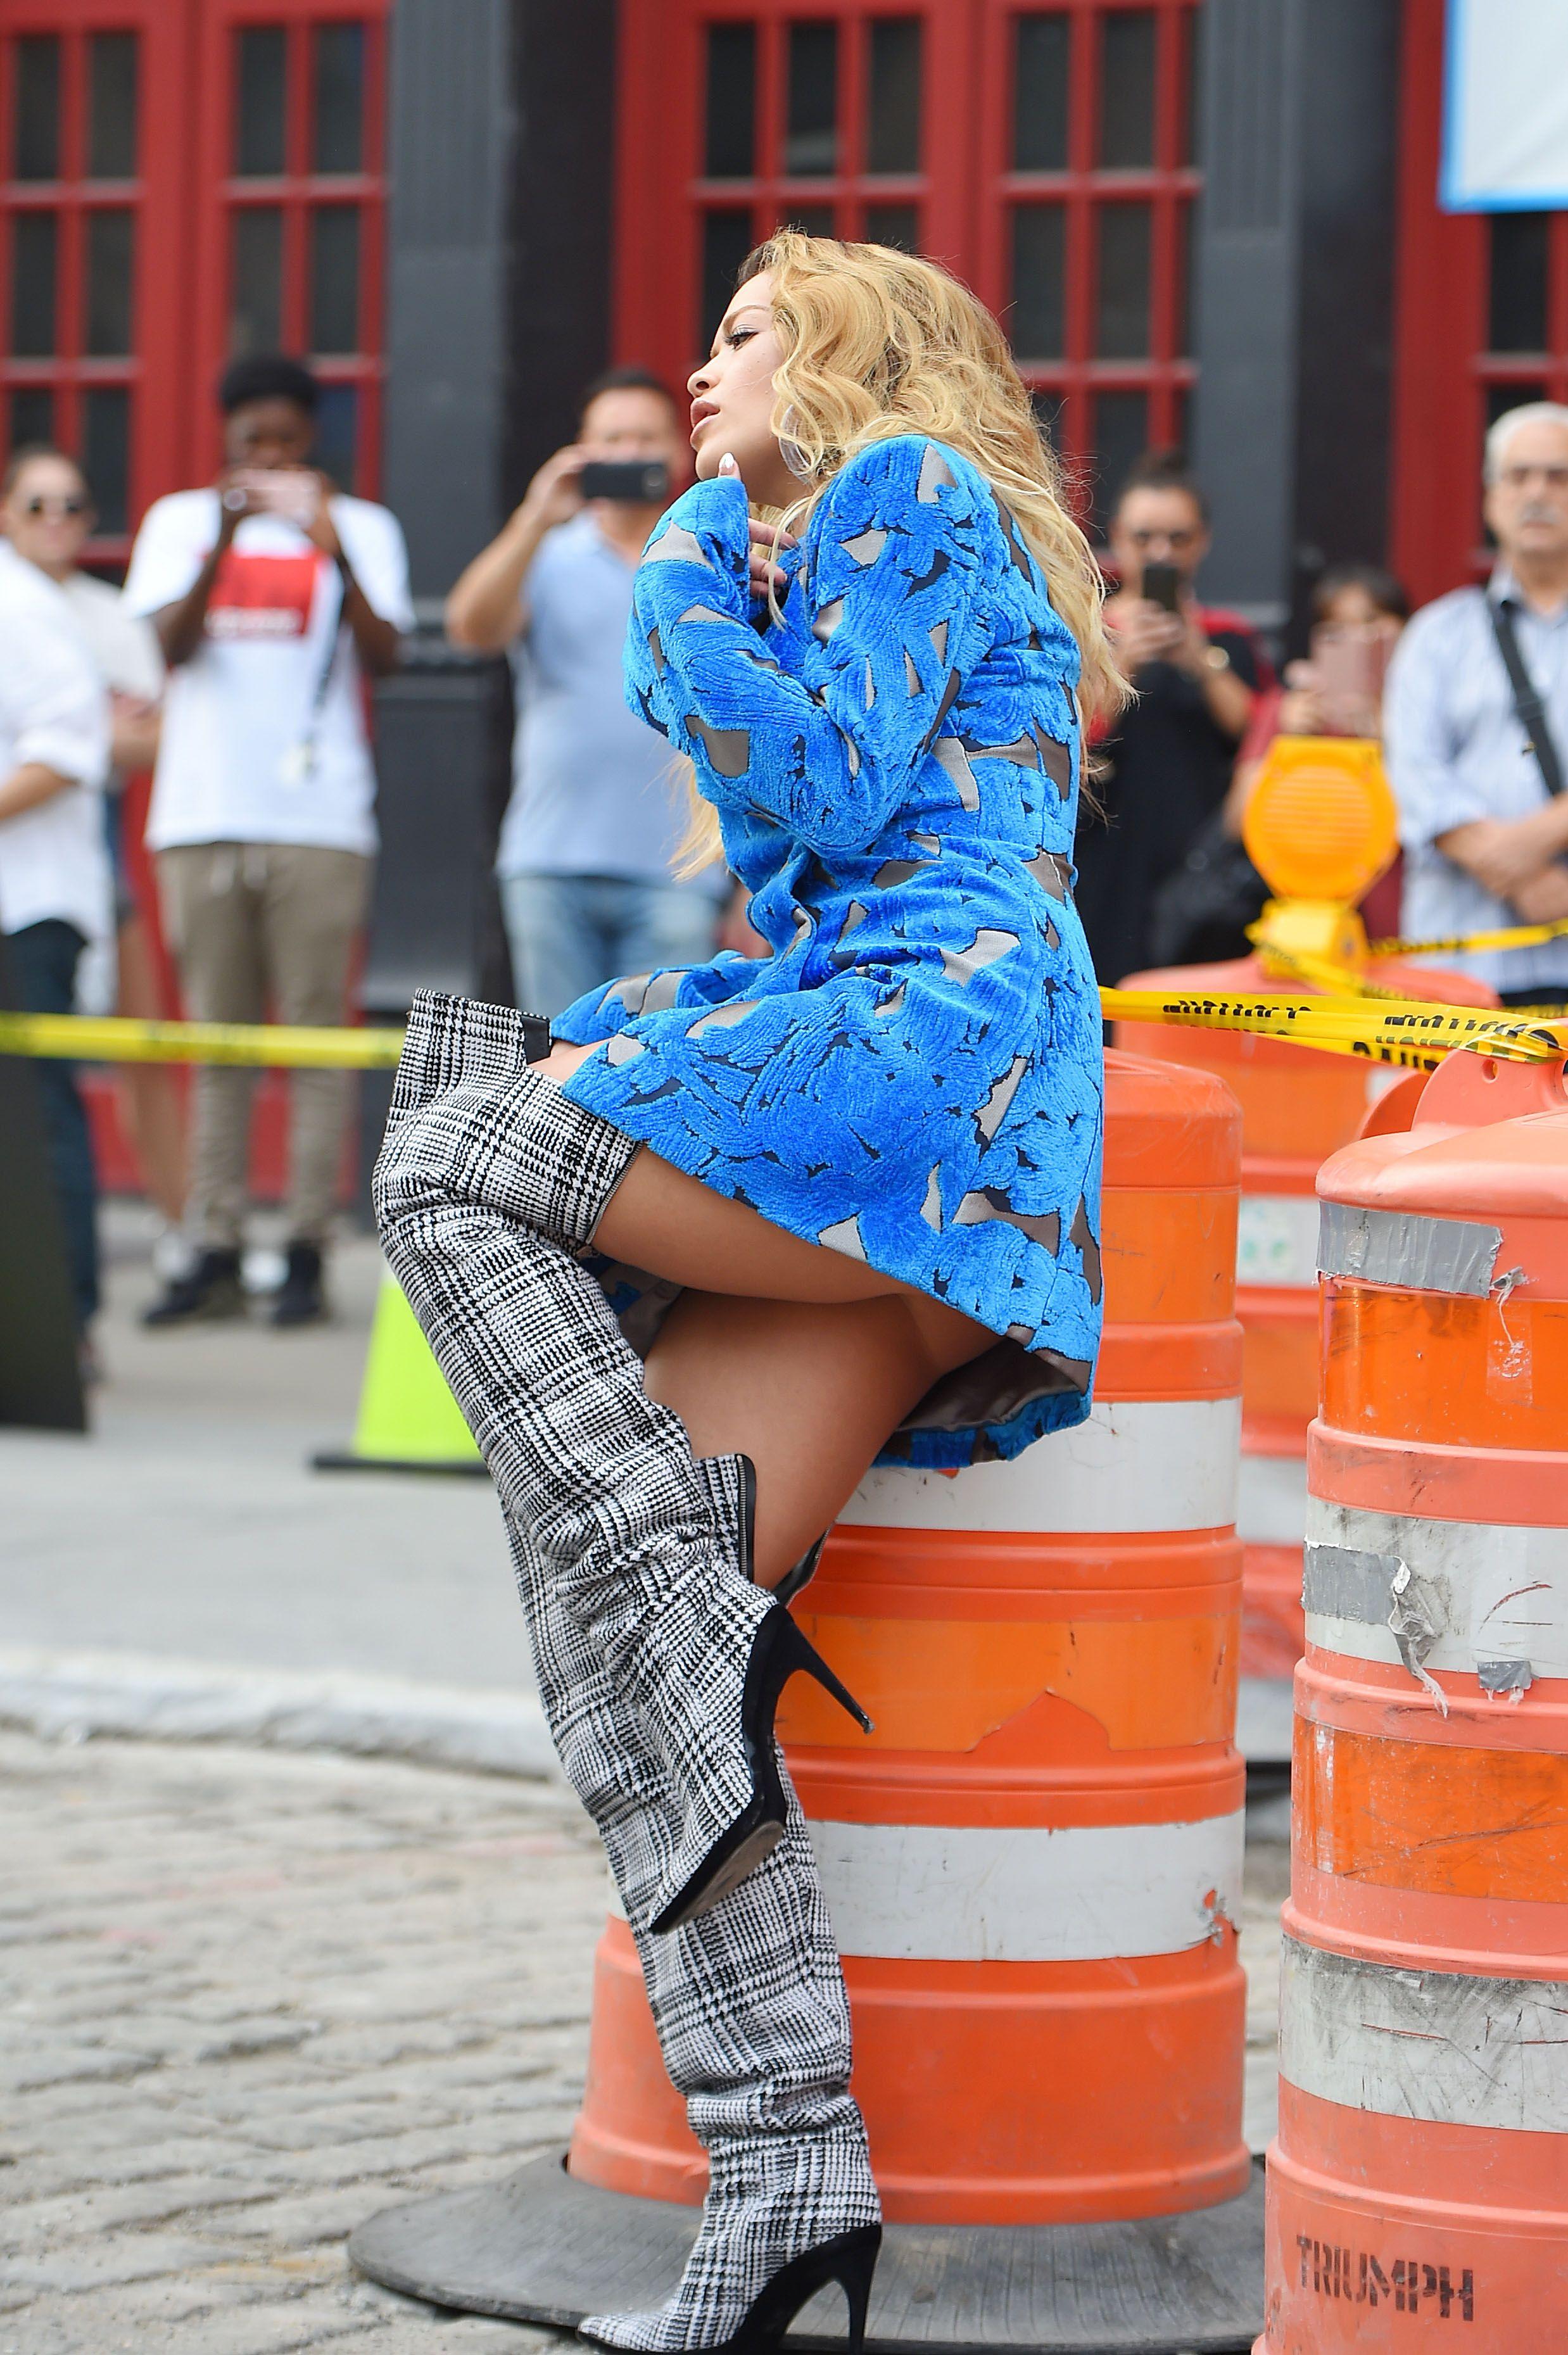 Rita Ora - upskirt during her video shoot in NYC